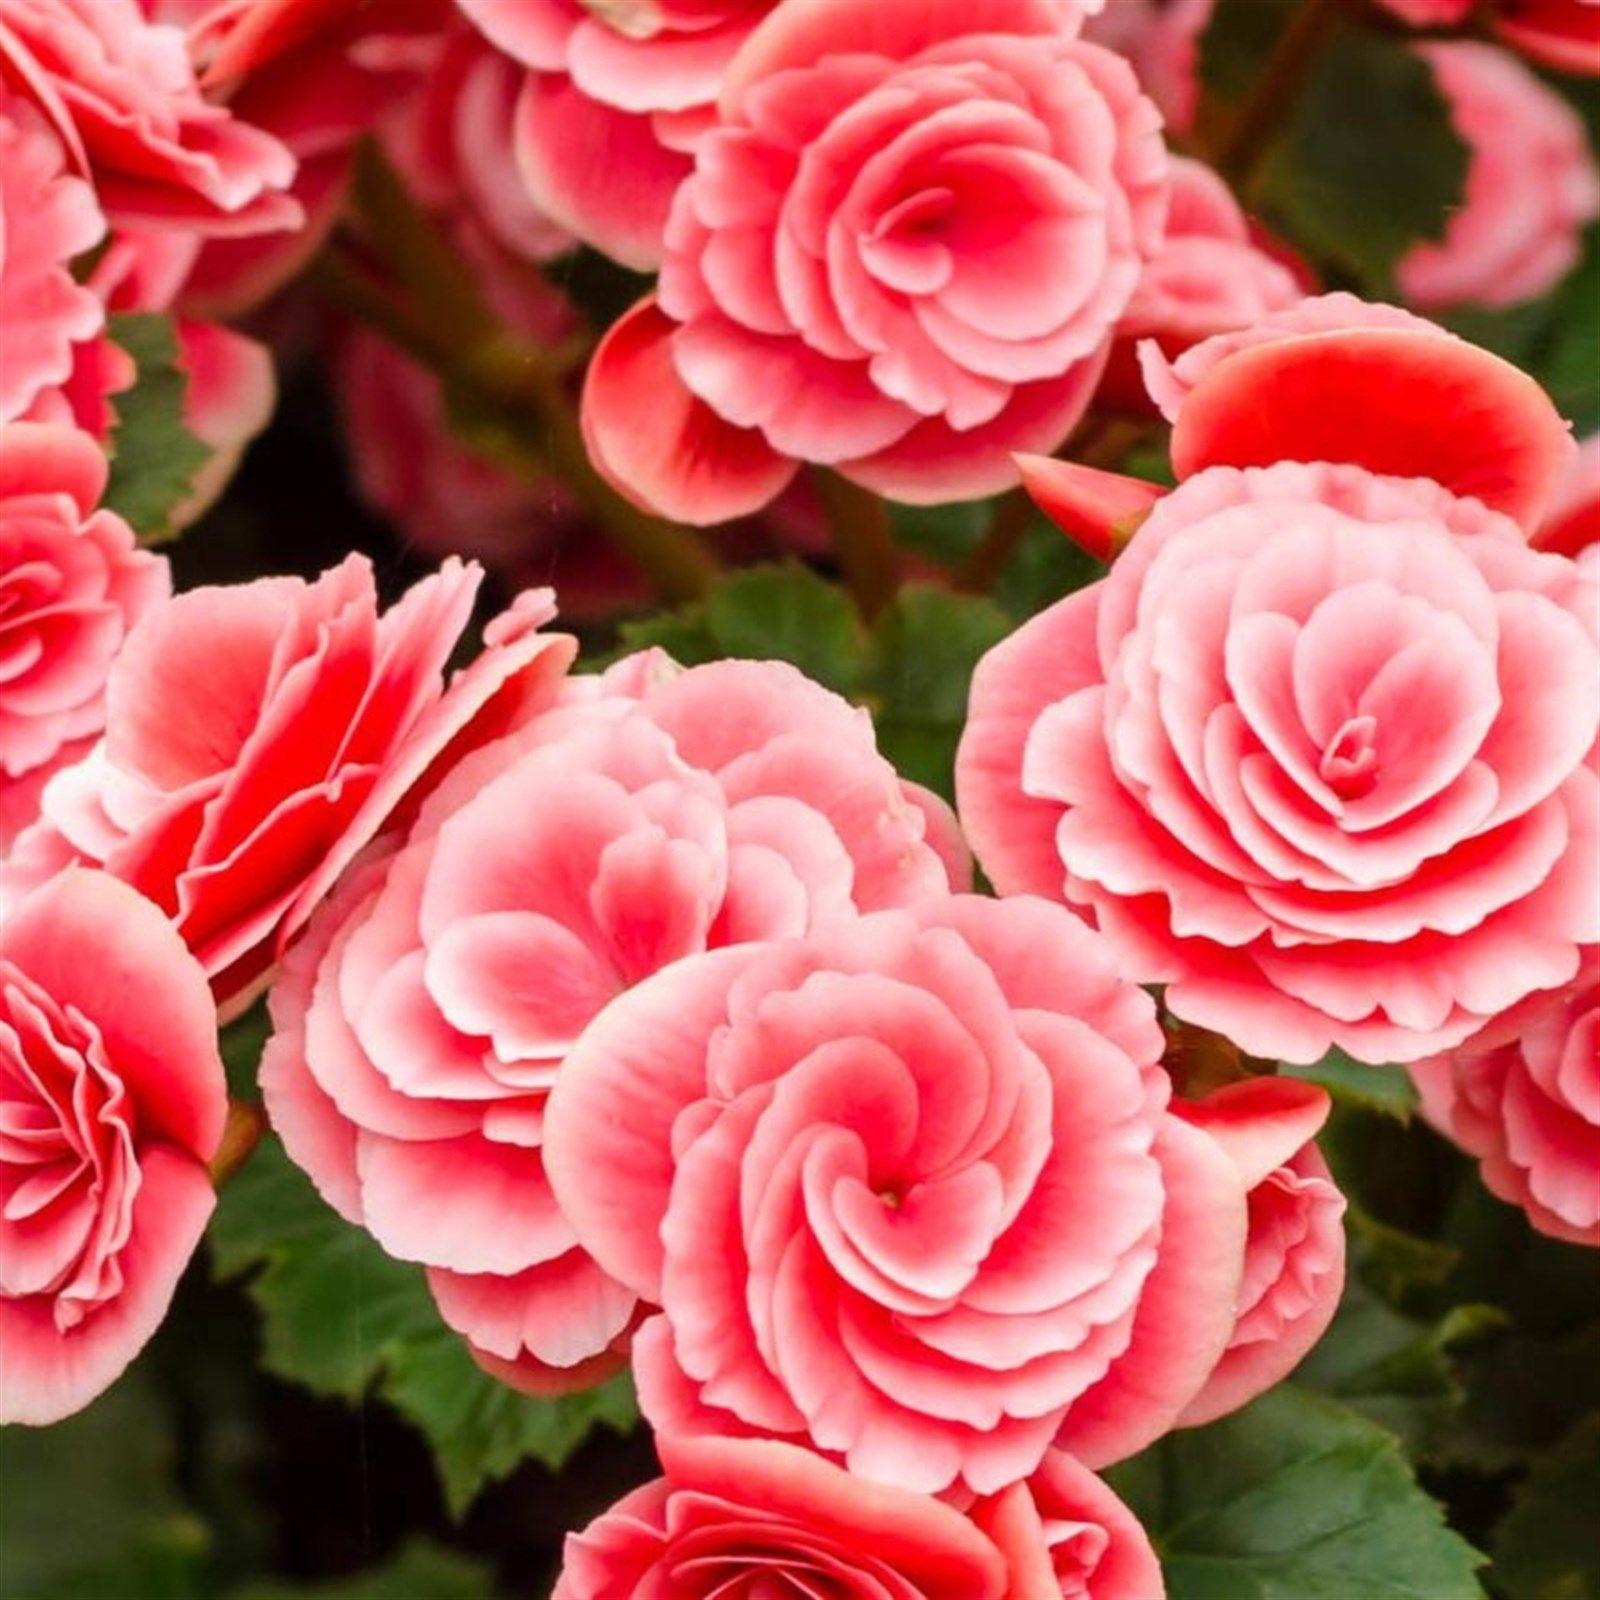 Strawberry Ripple Begonia Flower Bulbs 4 Pack In 2020 Bulb Flowers Flowers Perennials Begonia